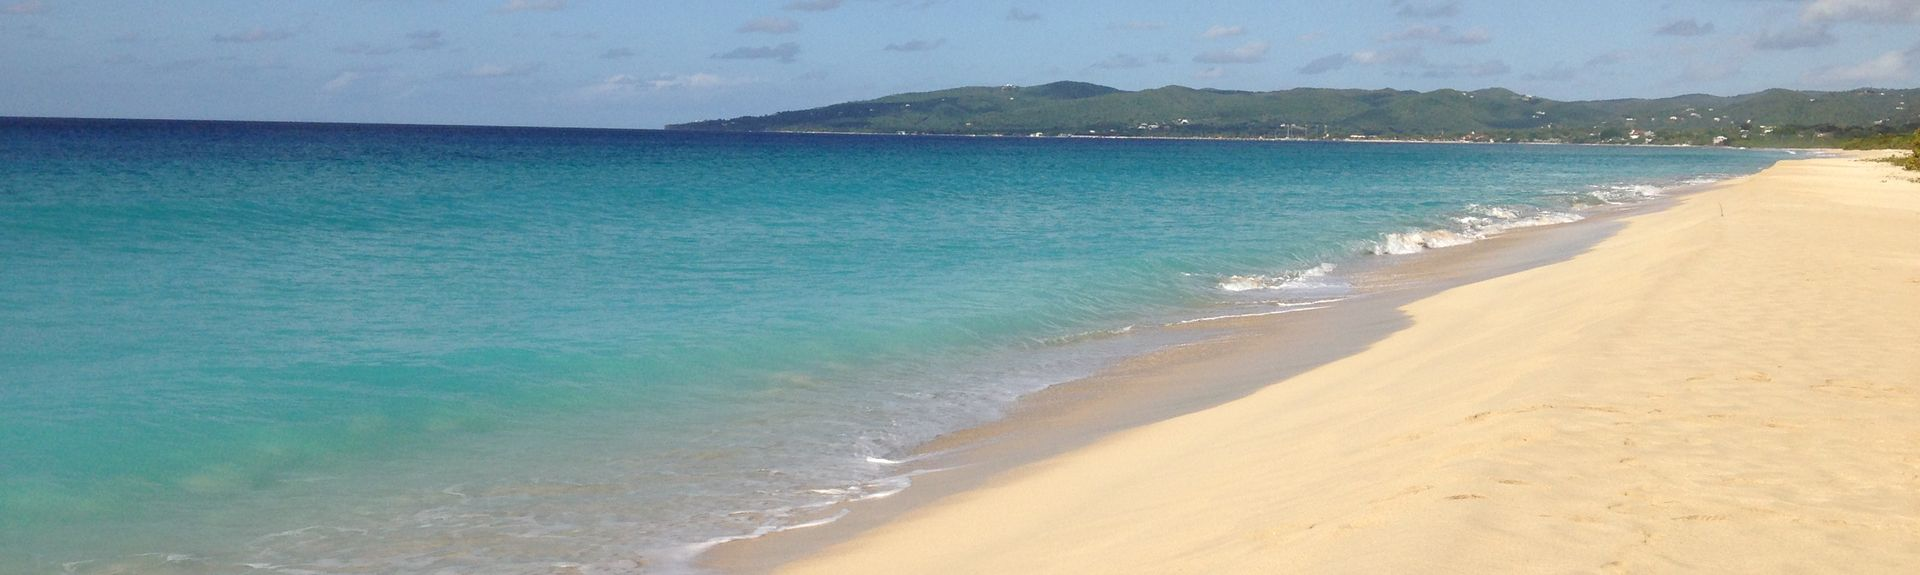 Teagues Bay, Saint Croix, Jungferninseln